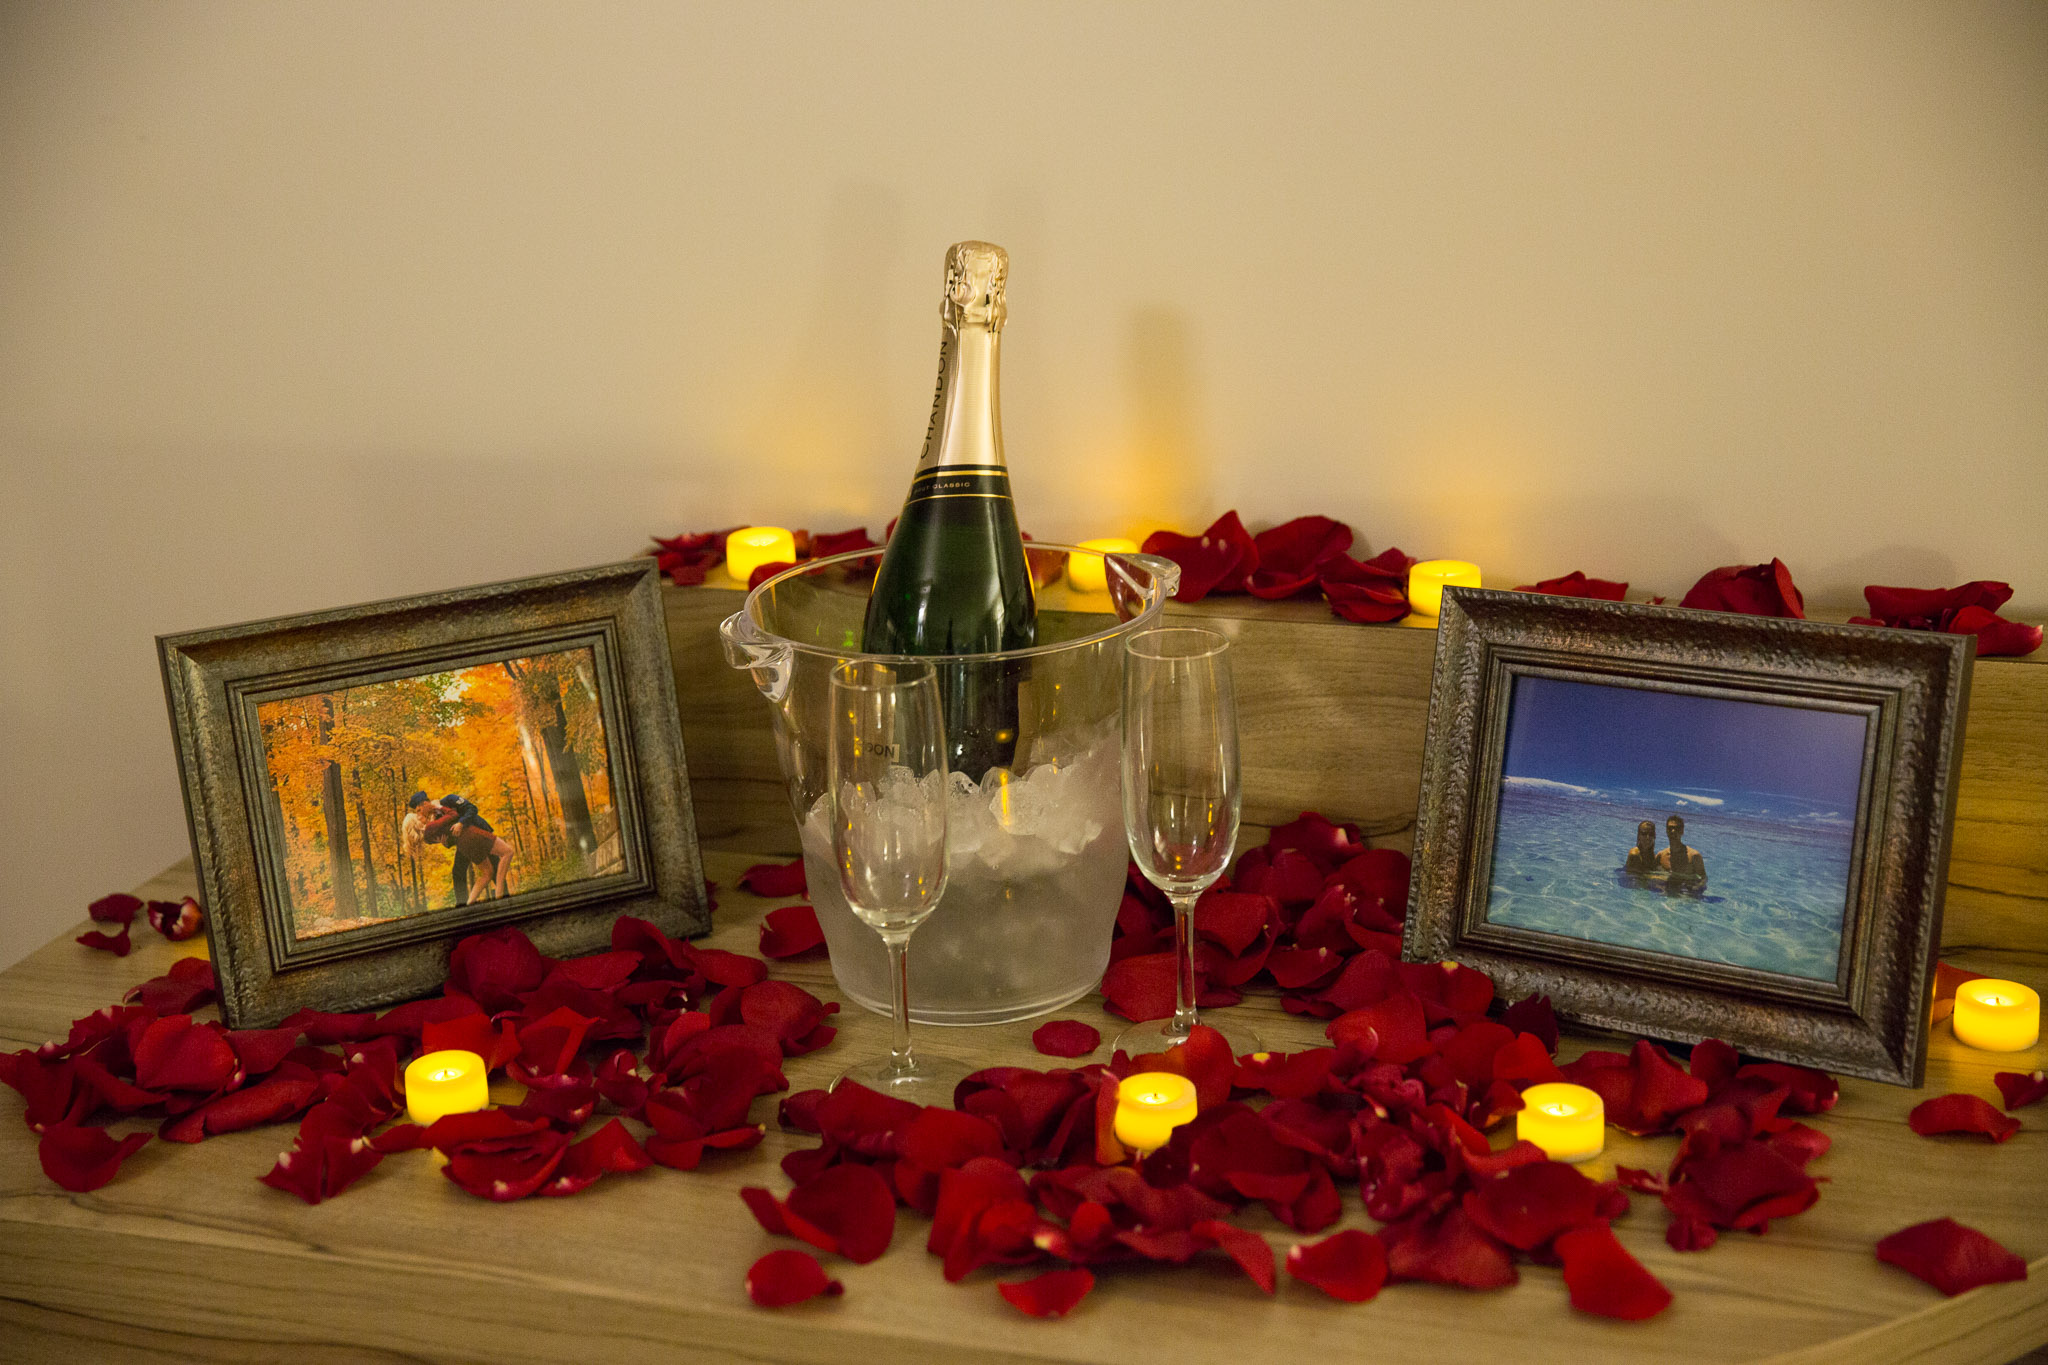 romantic-room-makeover-4.jpg